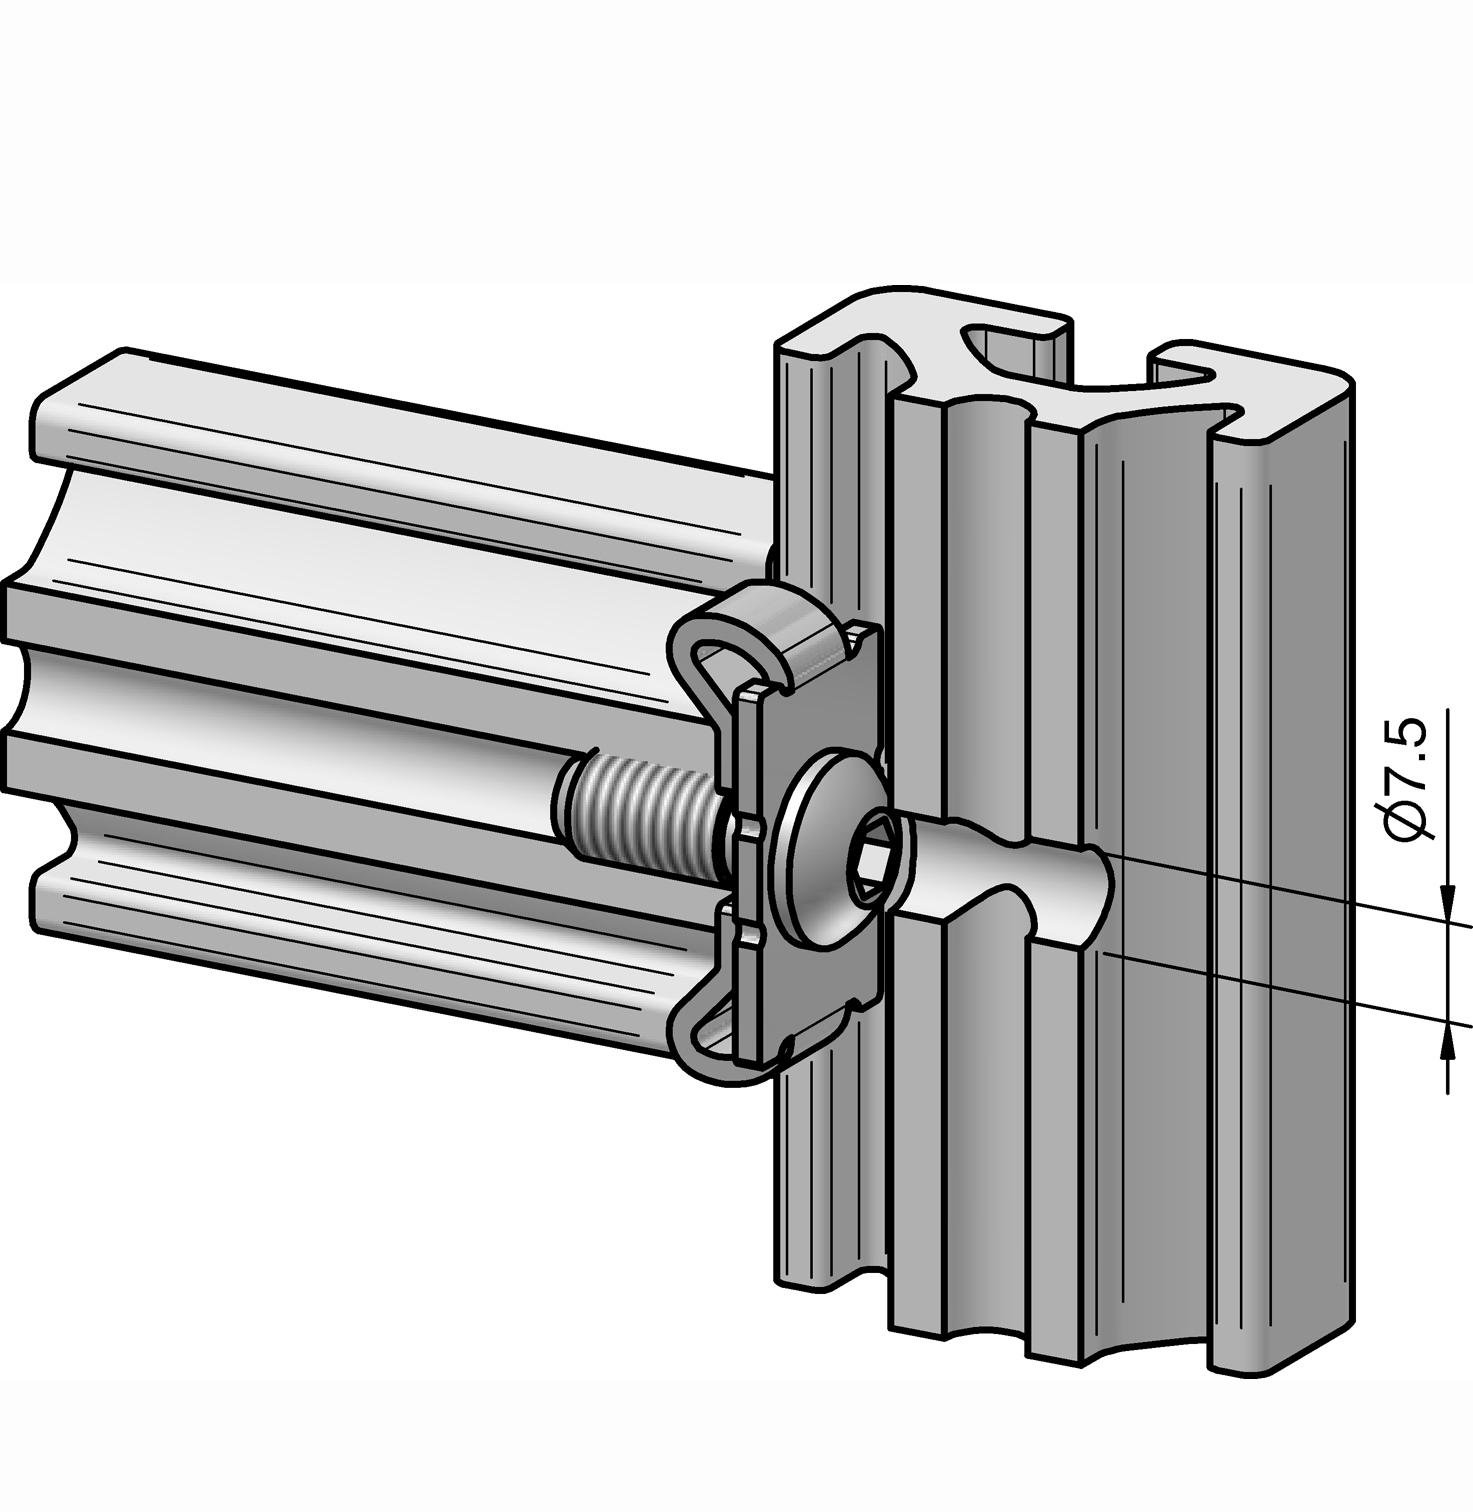 Zentrierplattensatz | Alváris Profile Systems